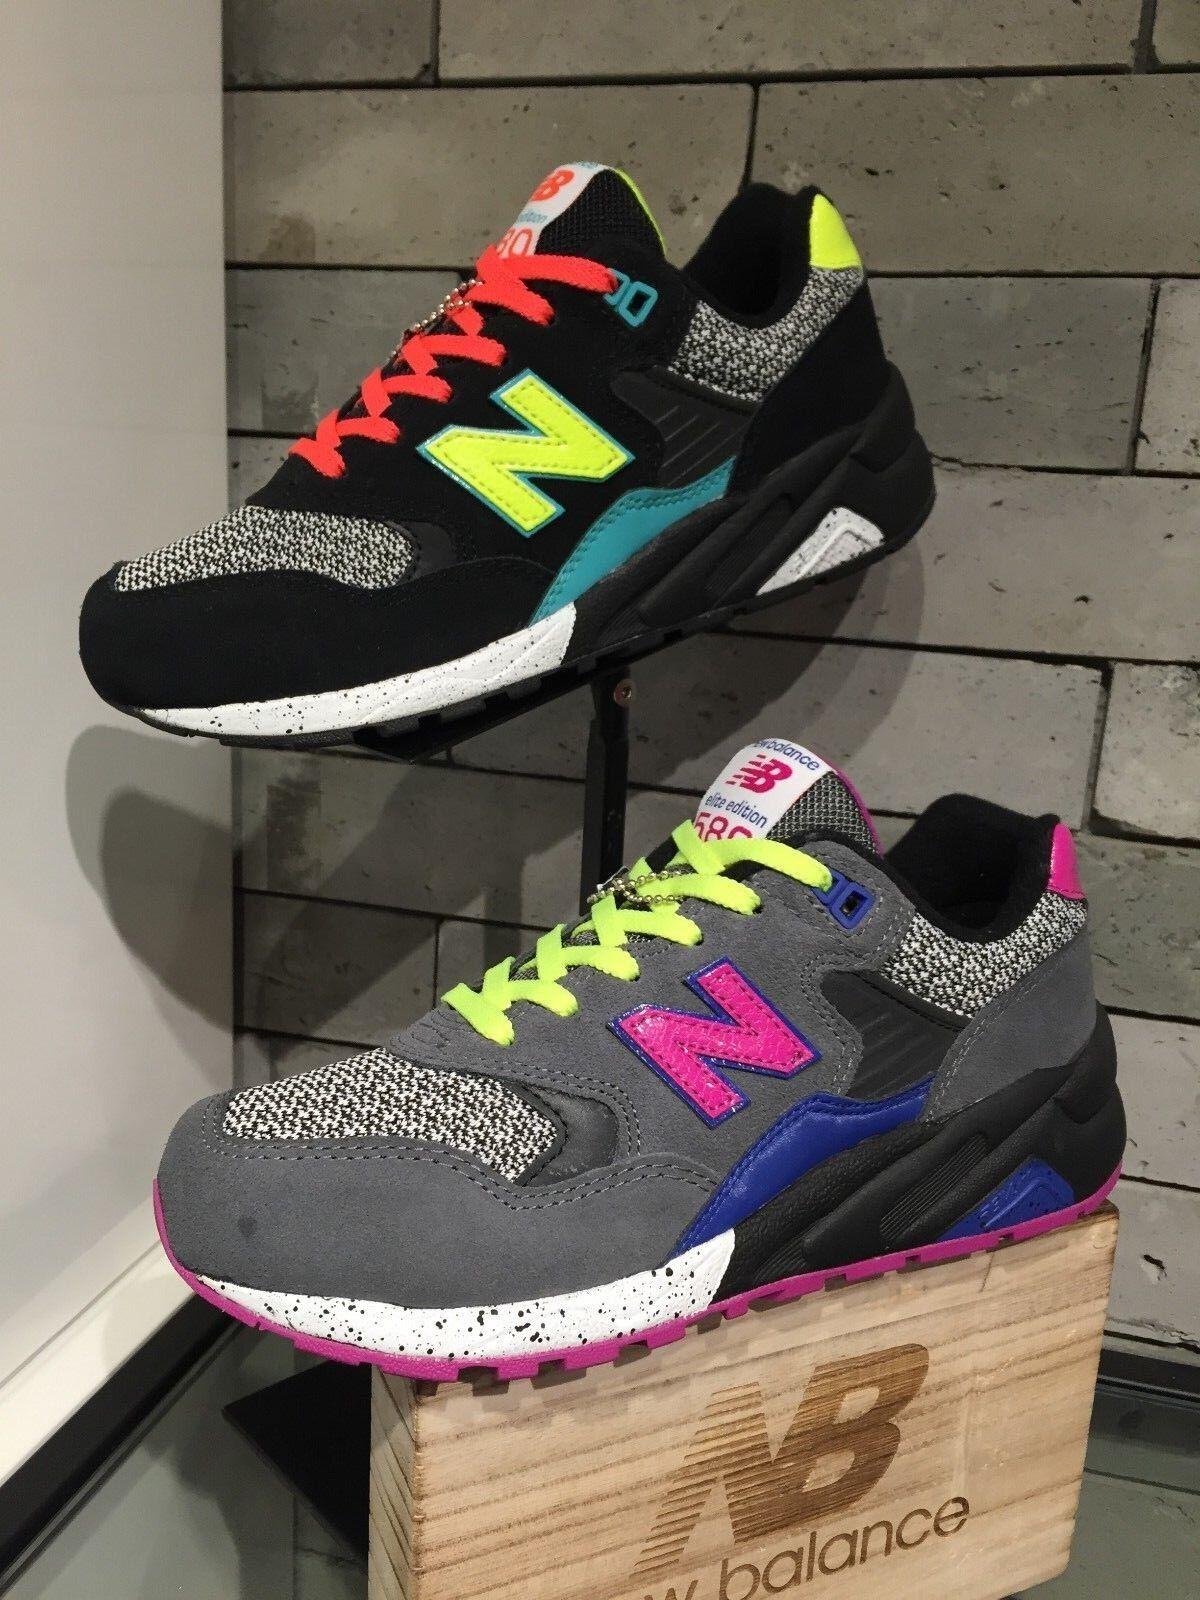 New Balance WRT580 Lifestyle femmes Athletic chaussures WRT580BK noir WRT580GY gris